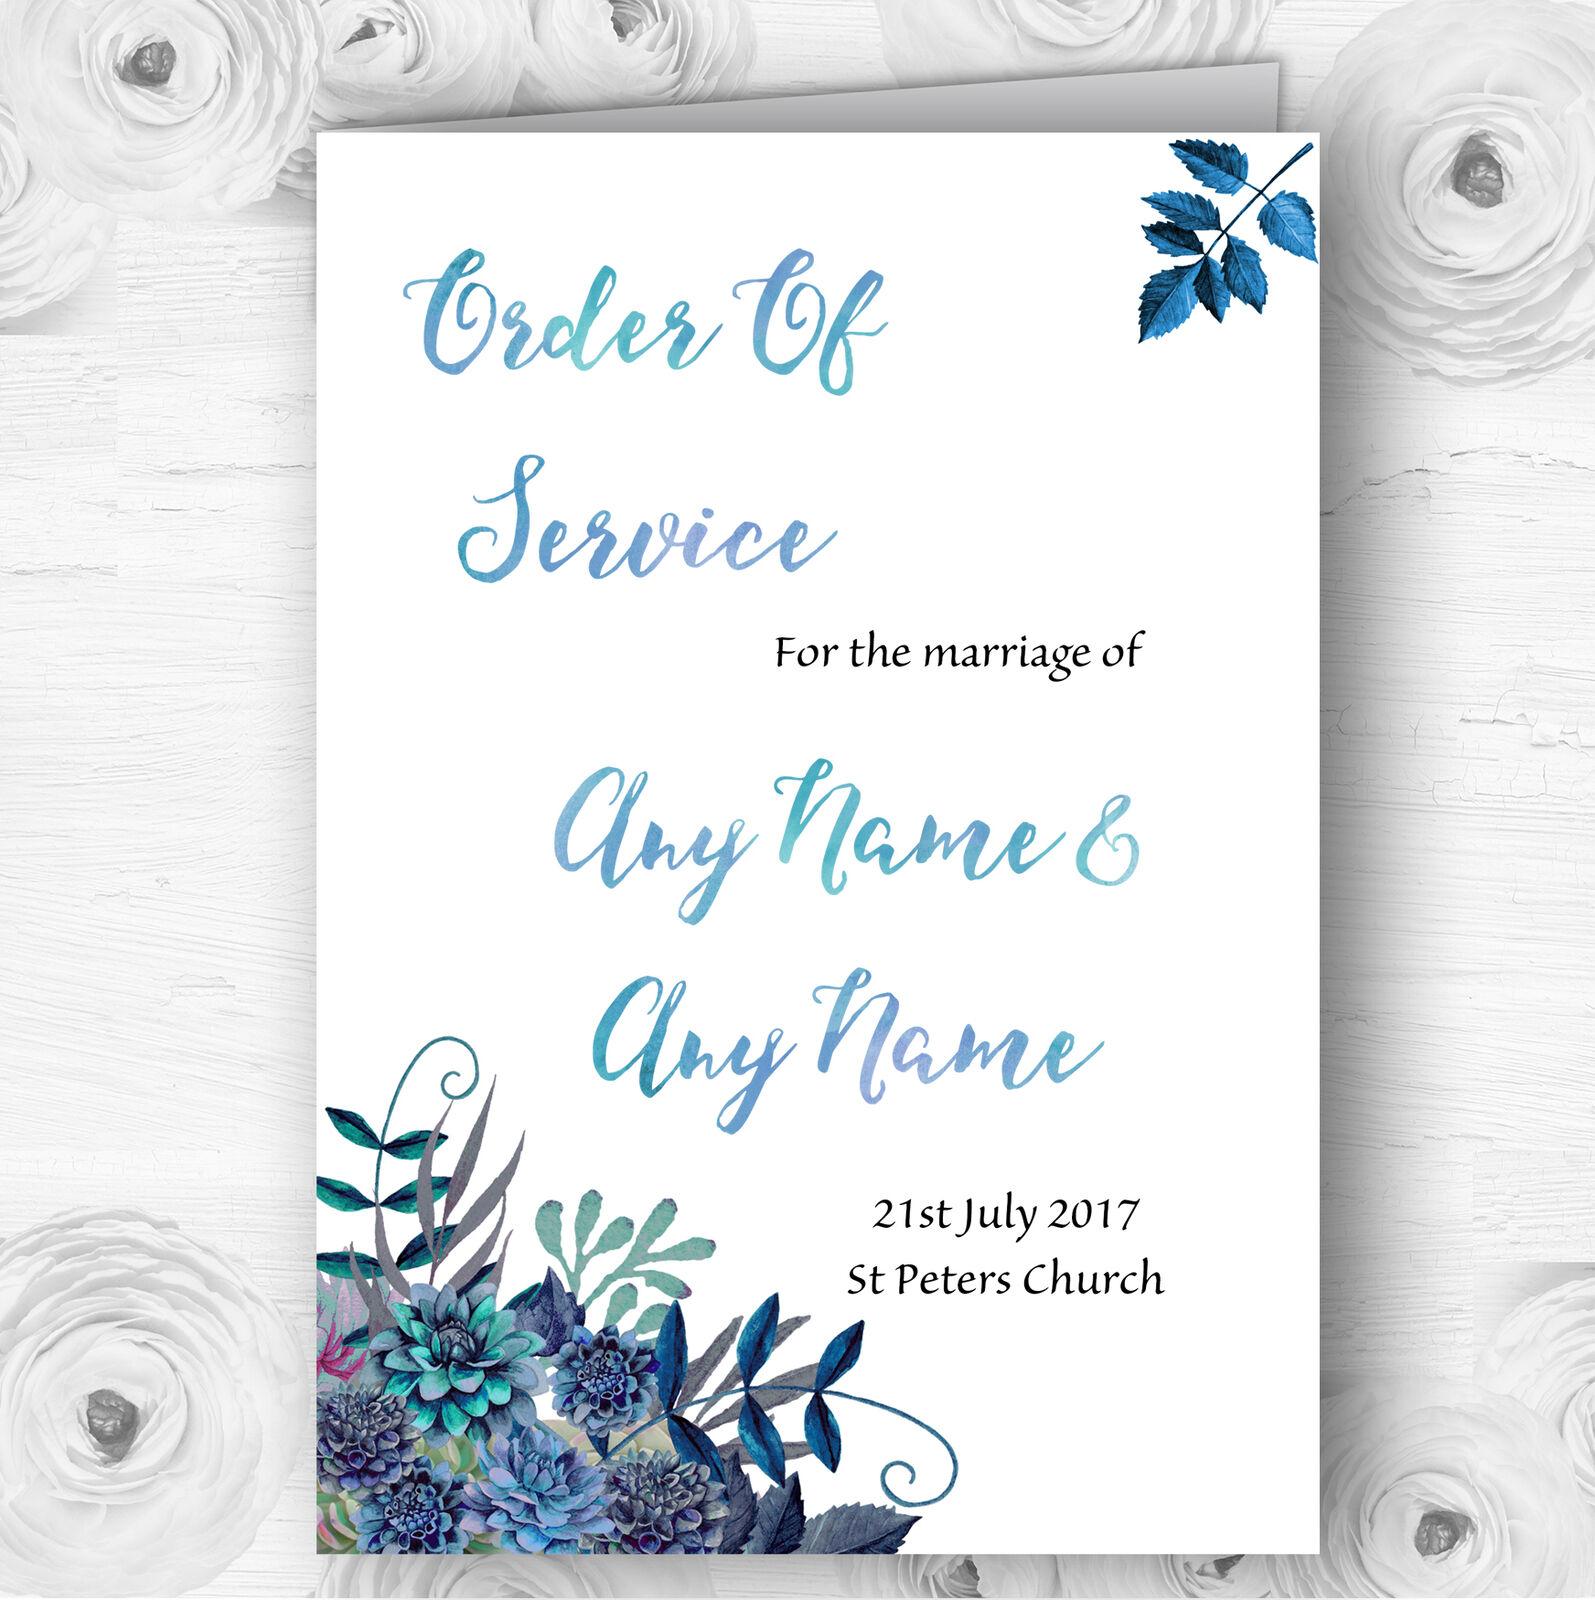 Aqua Grün & Blau Watercolour Florals Wedding Double Cover Order Of Service